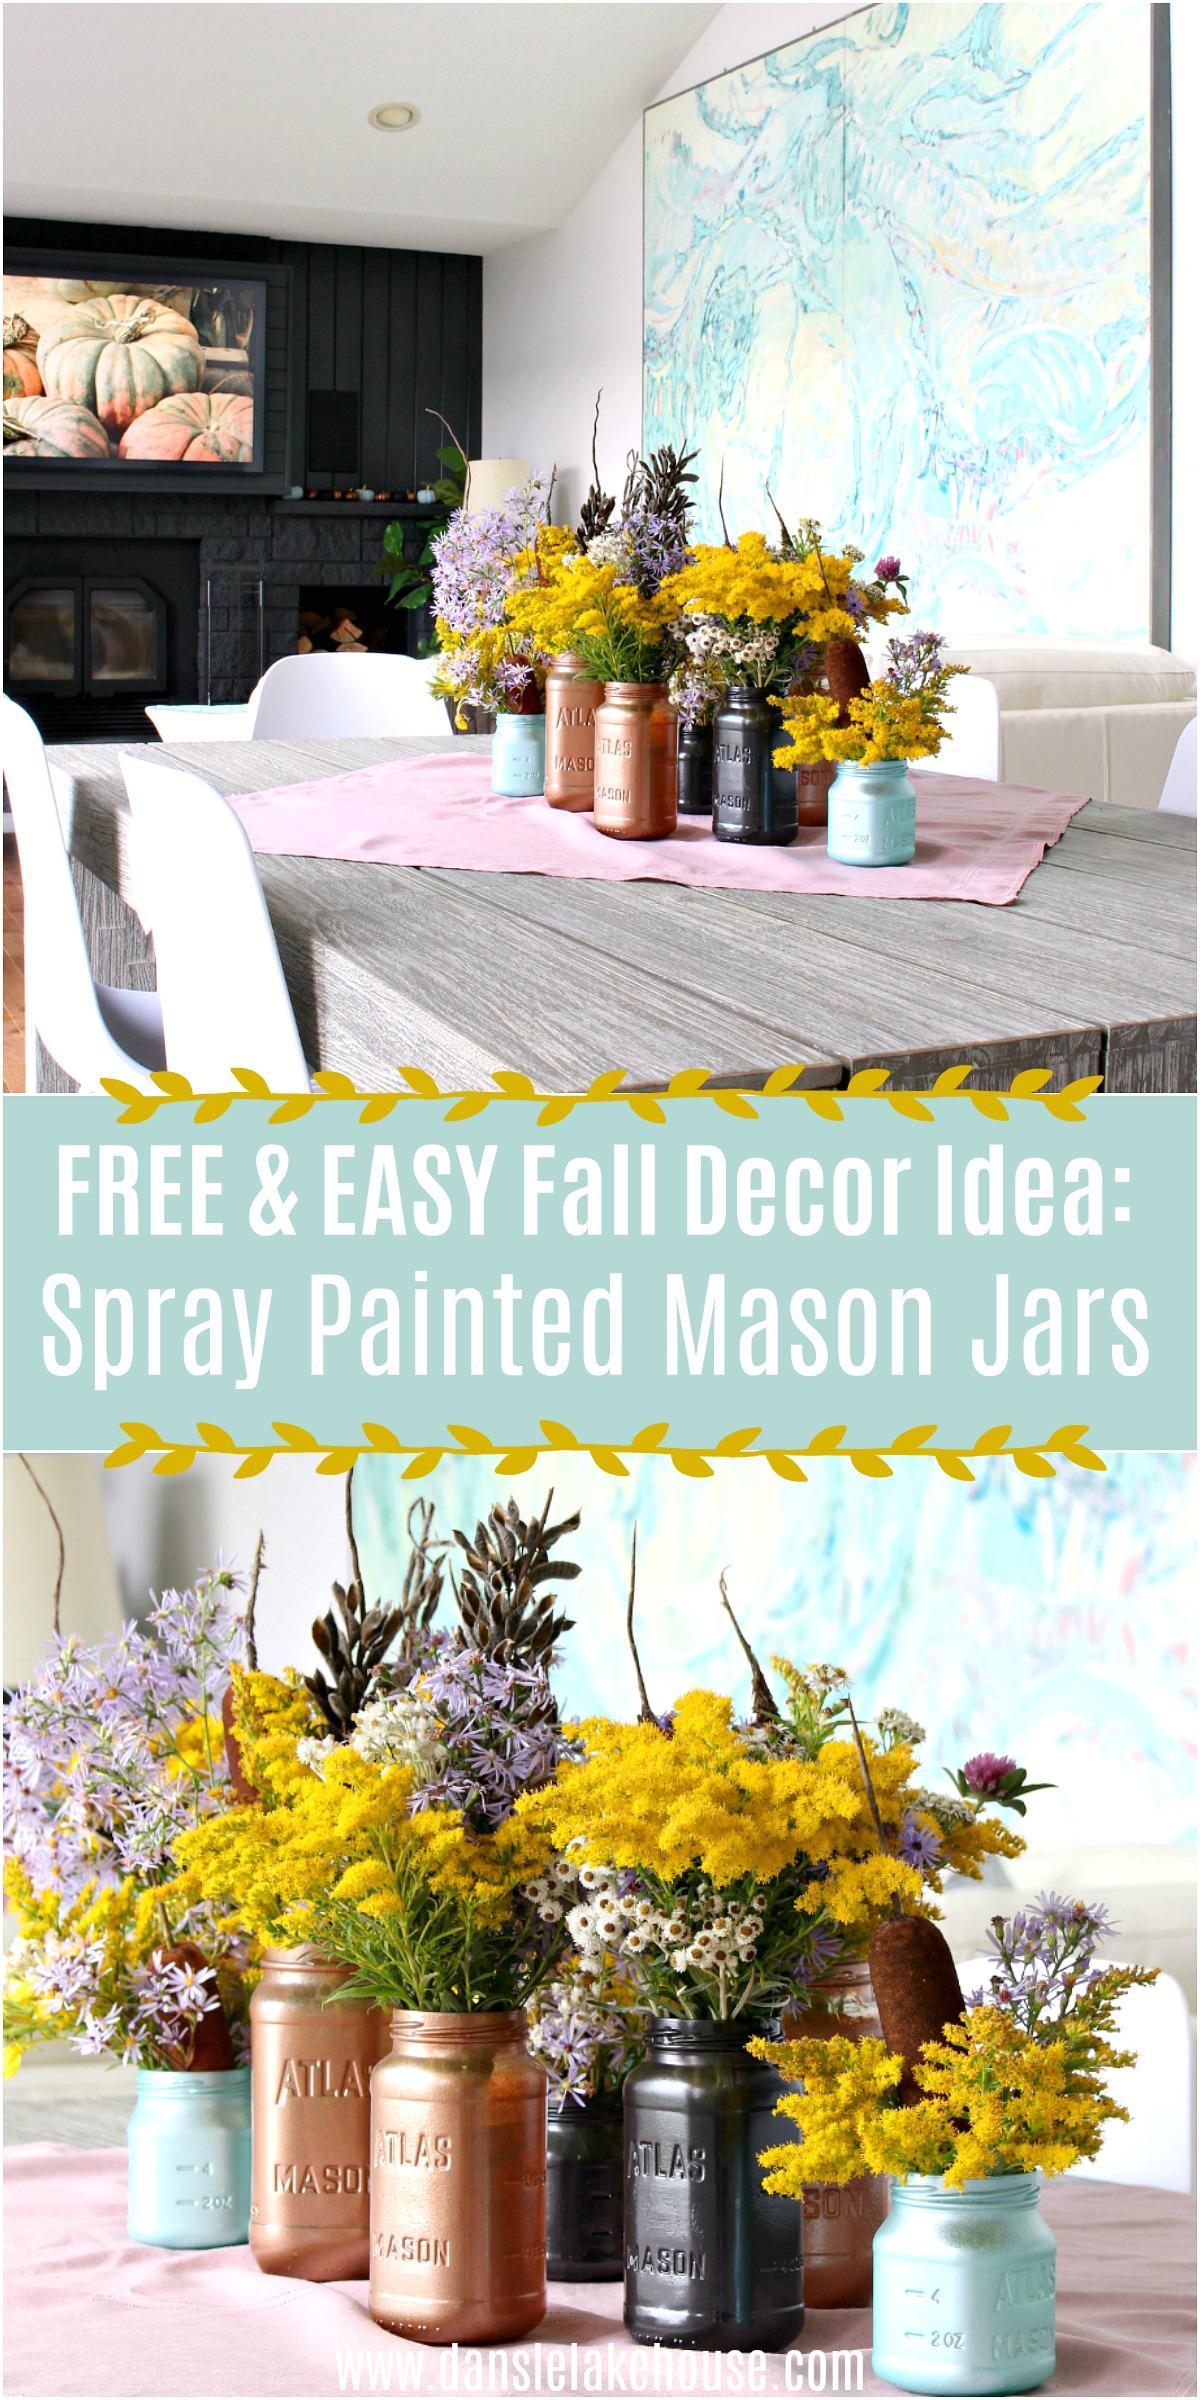 Free & Easy Fall Decor